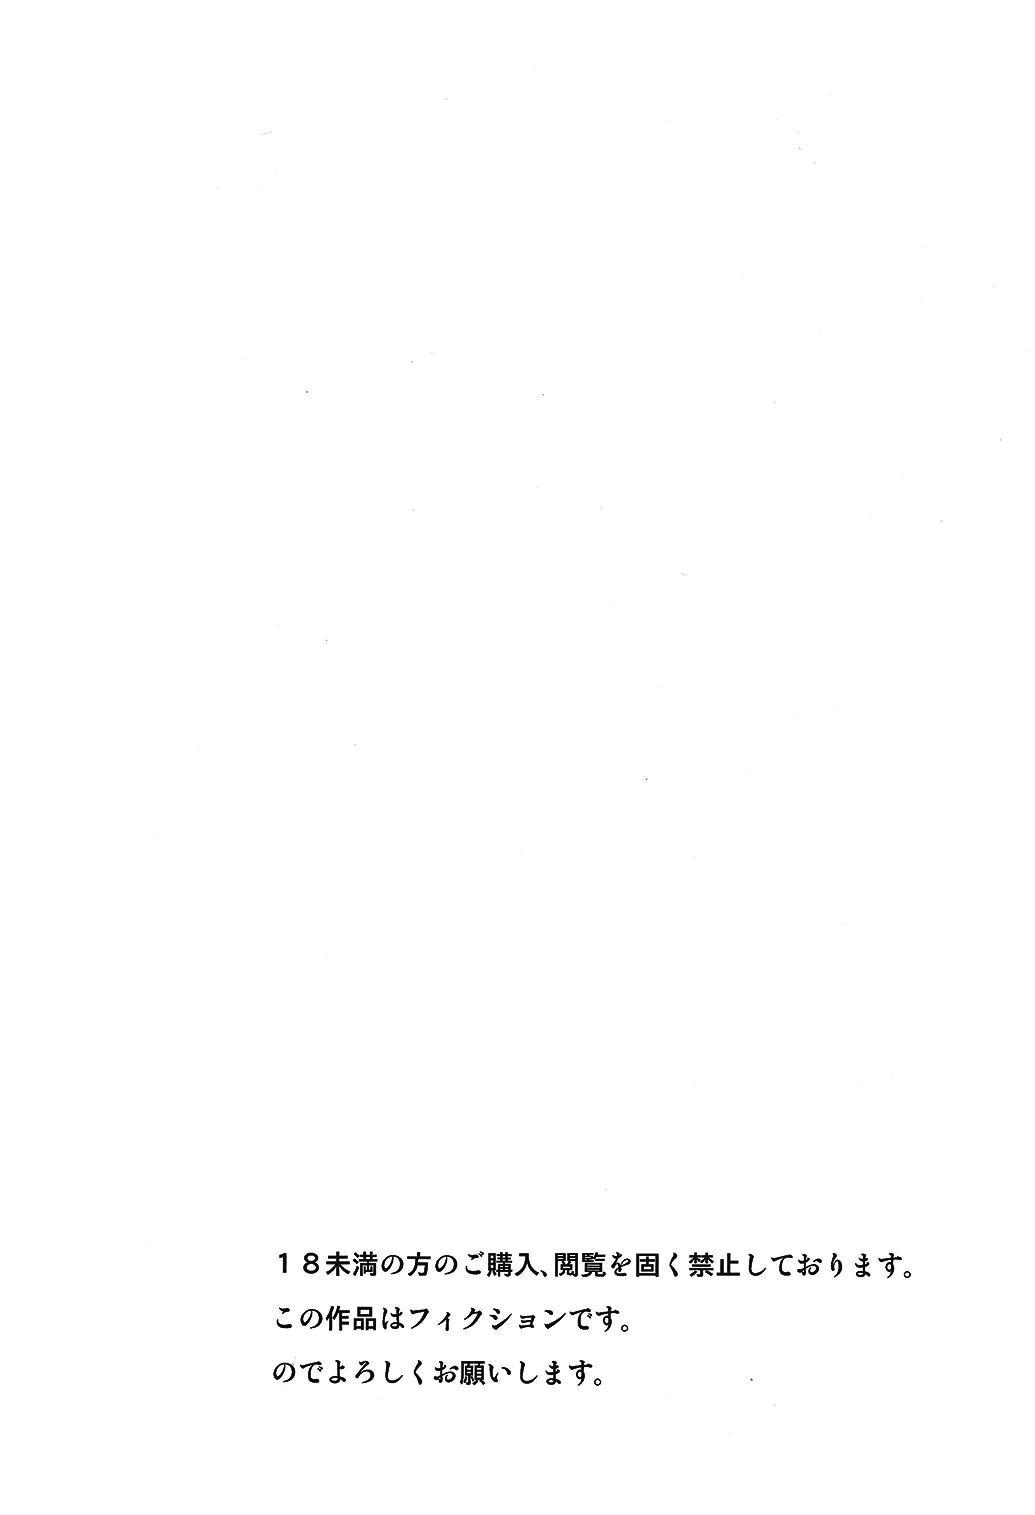 Nikuman Chokusou | Home Delivery Meat Buns 2